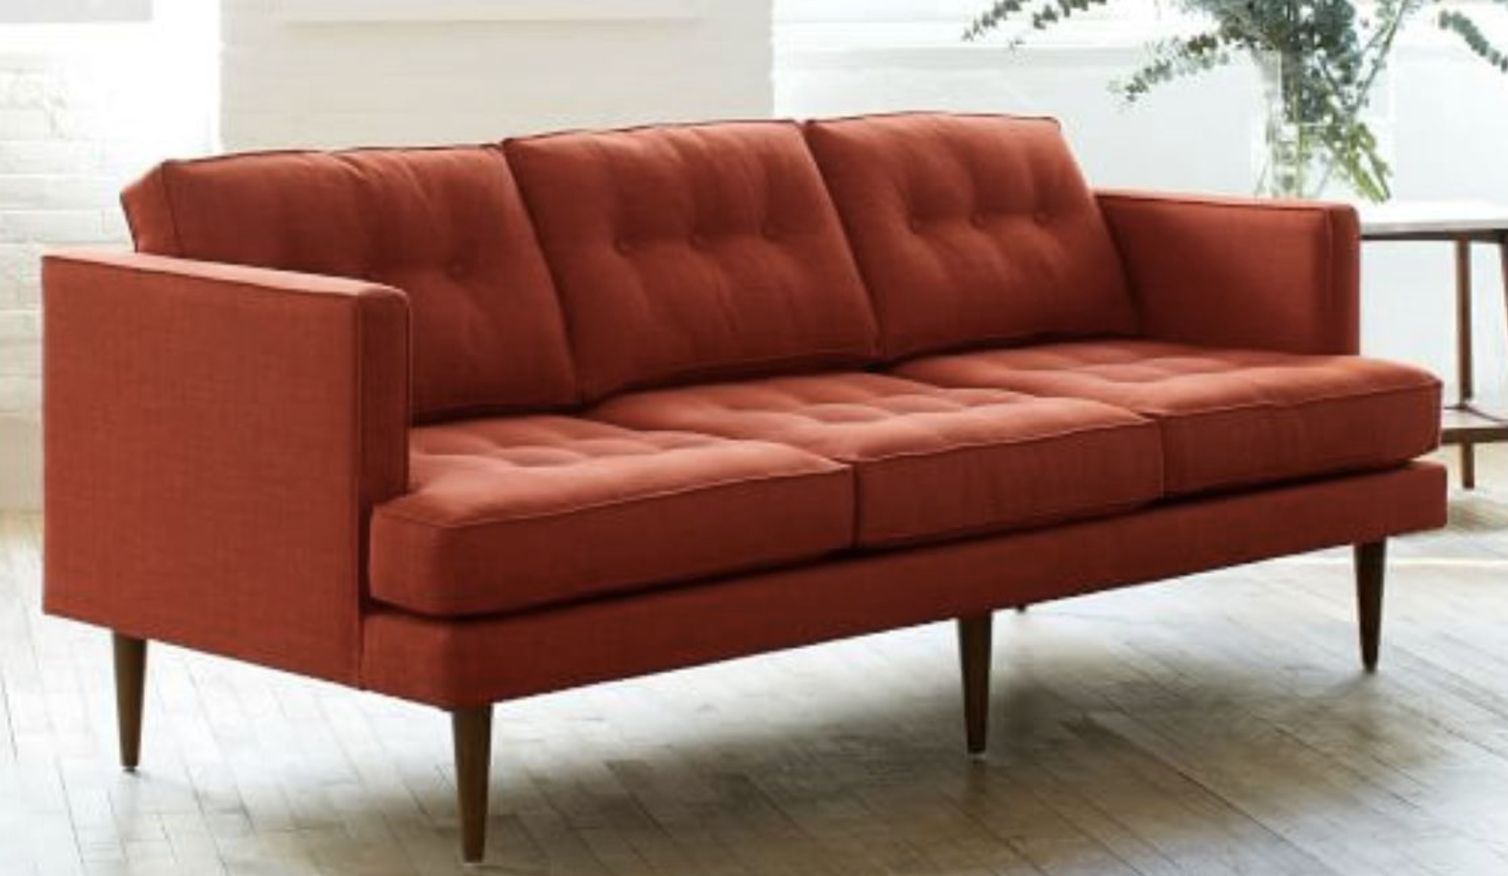 Teens slamming on sofa